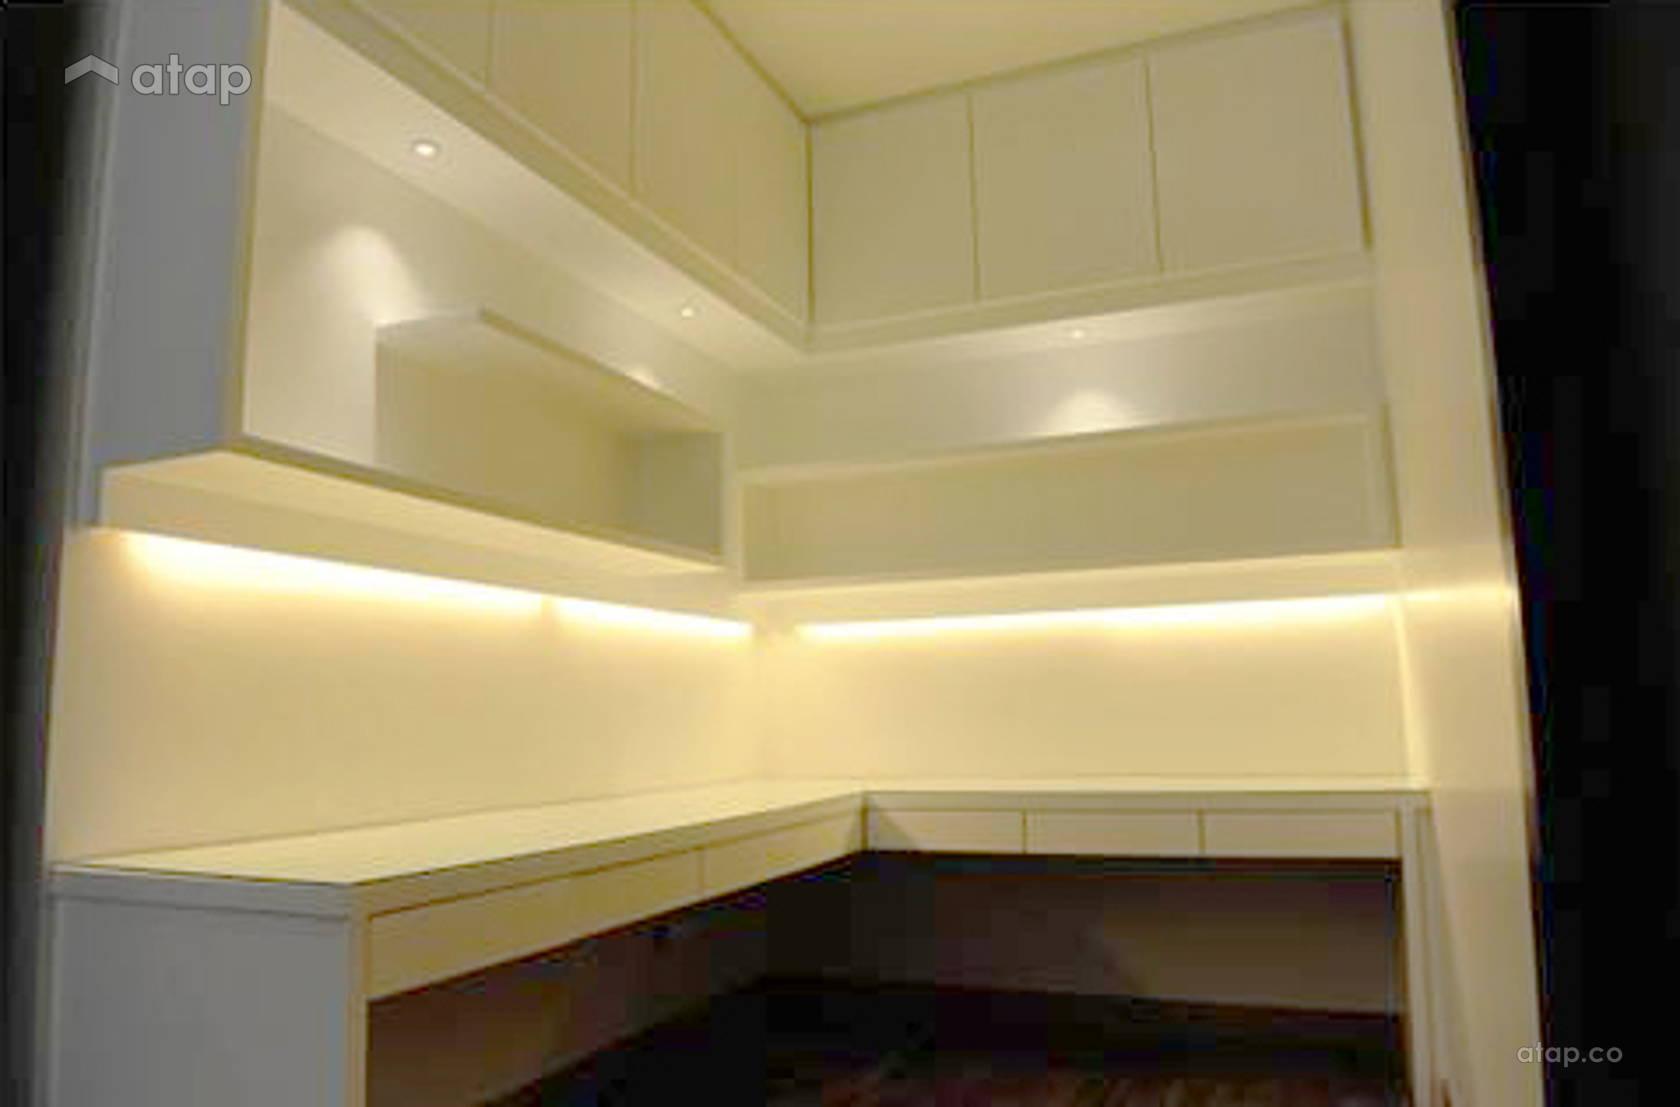 Bayu Segar Semi-Detached House interior design renovation ideas ...